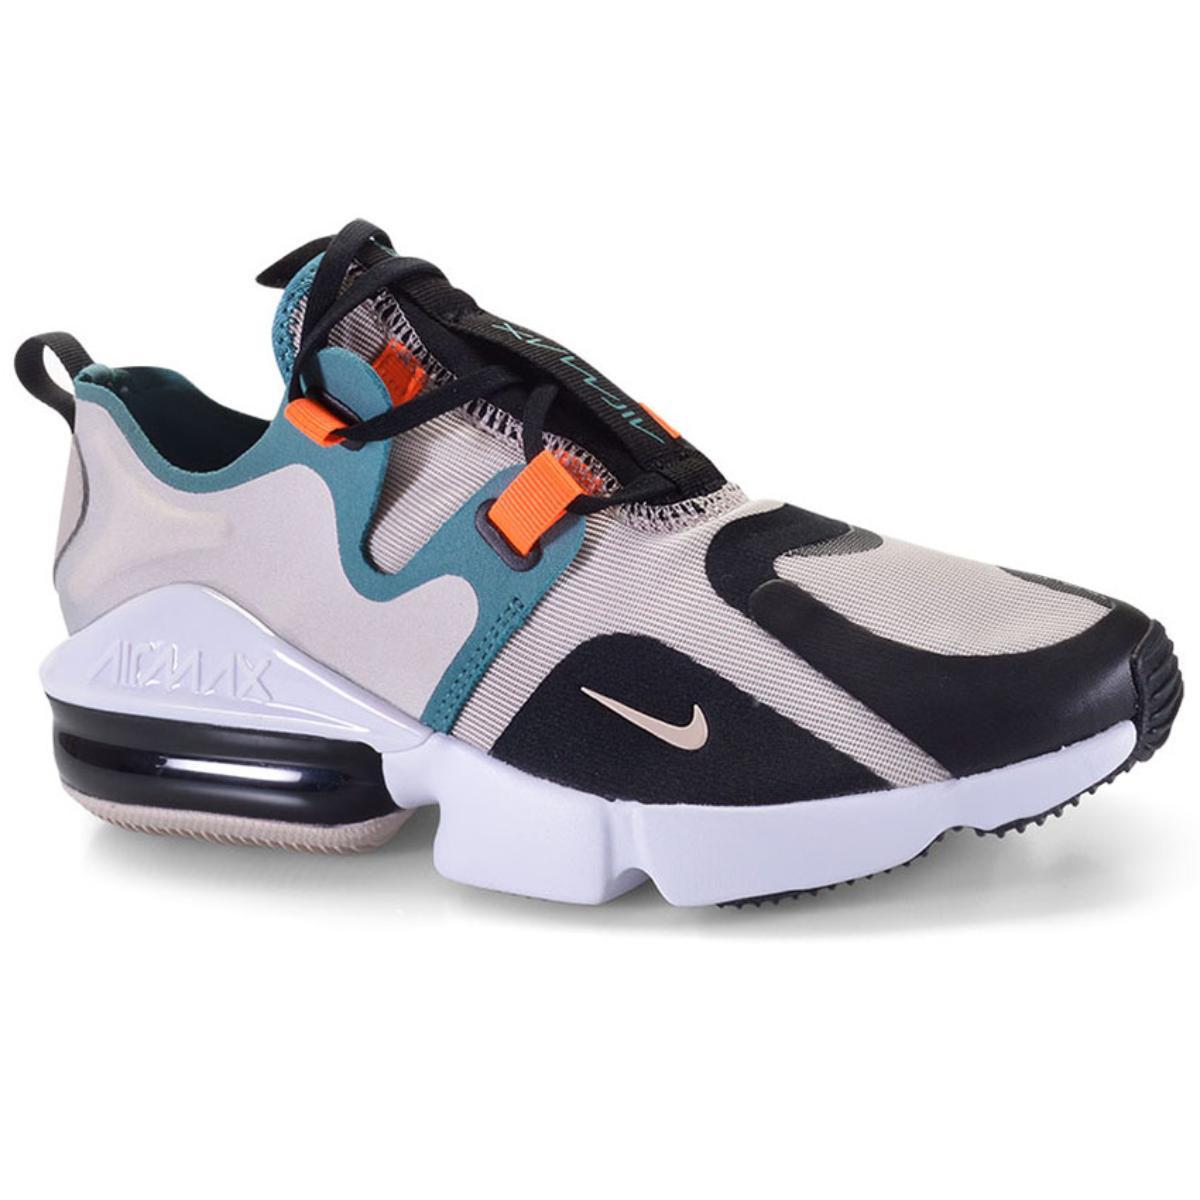 Tênis Masculino Nike Bq3999-002 Air Max Infinity Preto/branco/bege